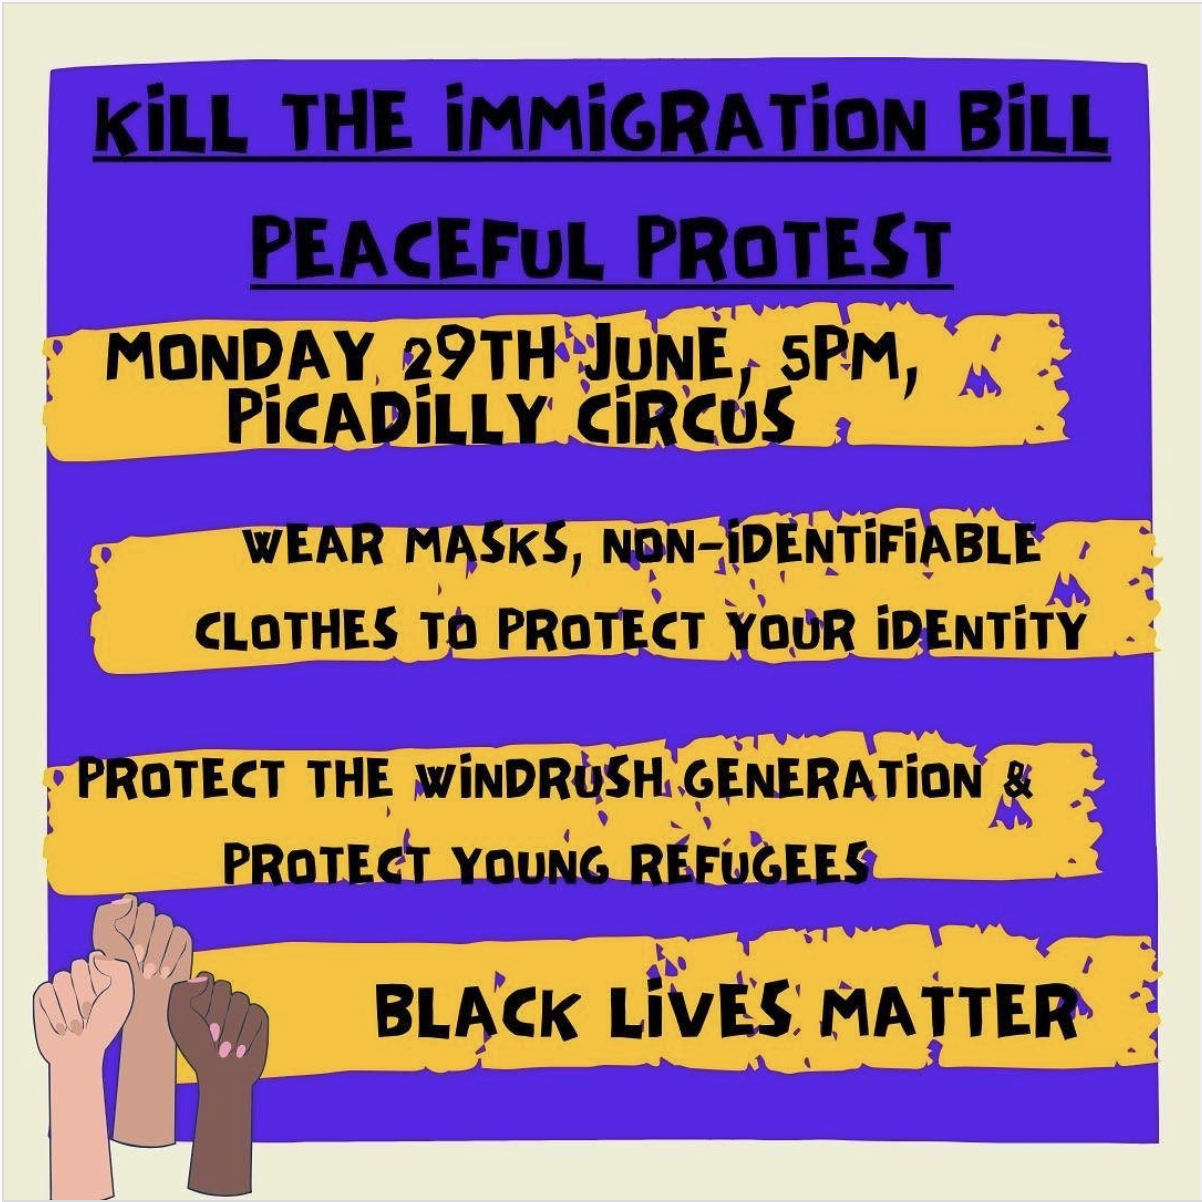 Kill the immigration bill! London, Monday 29 June 5pm